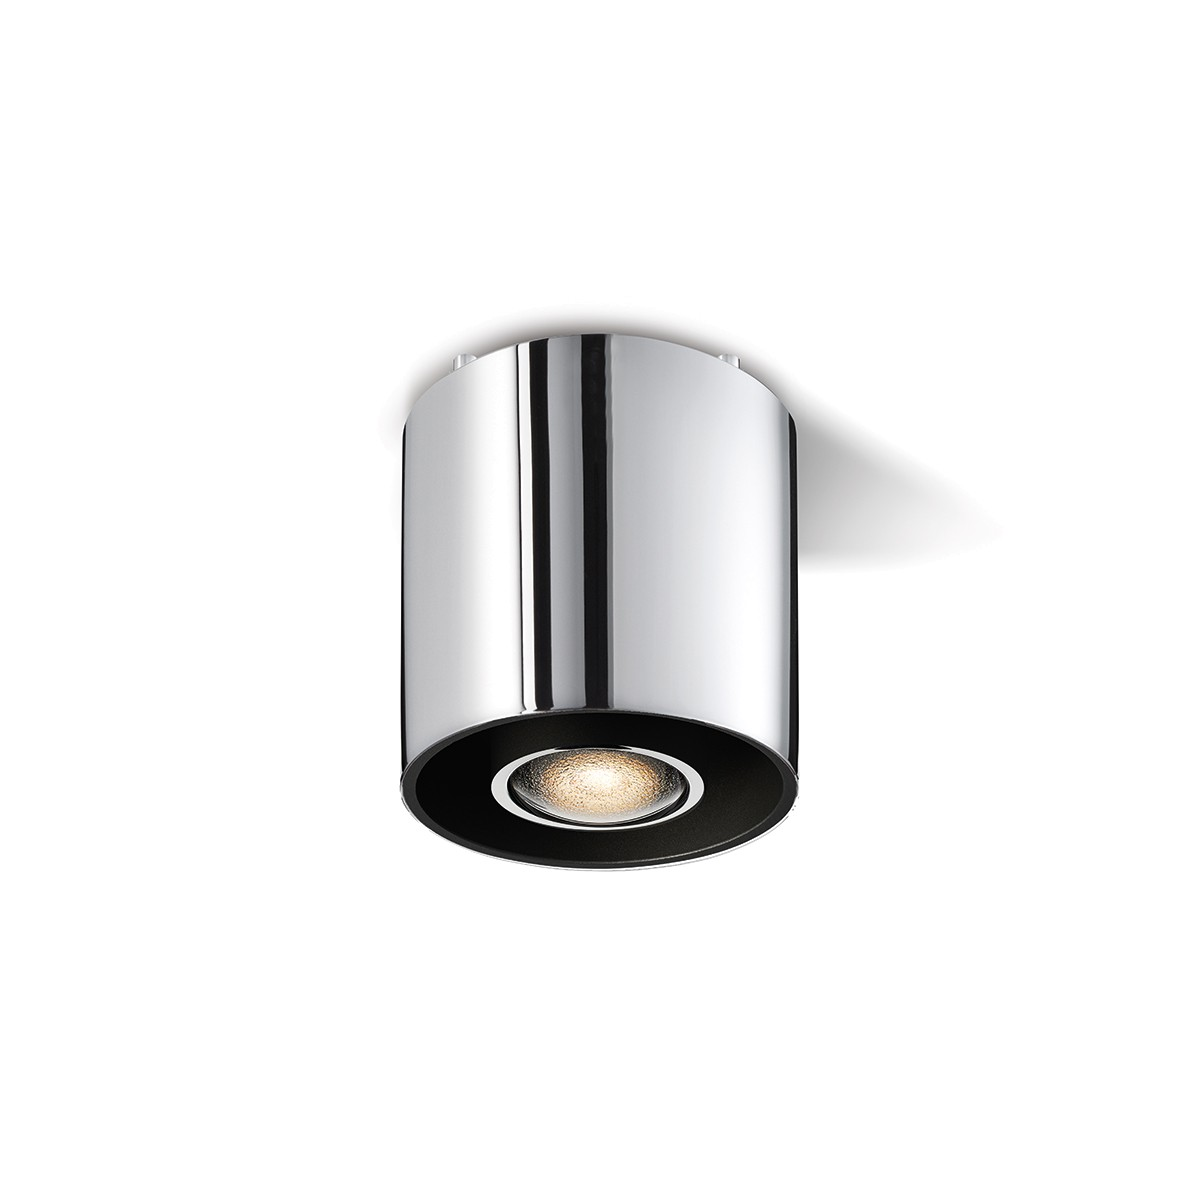 Bruck Cranny Spot LED Round C Deckenleuchte, Chrom